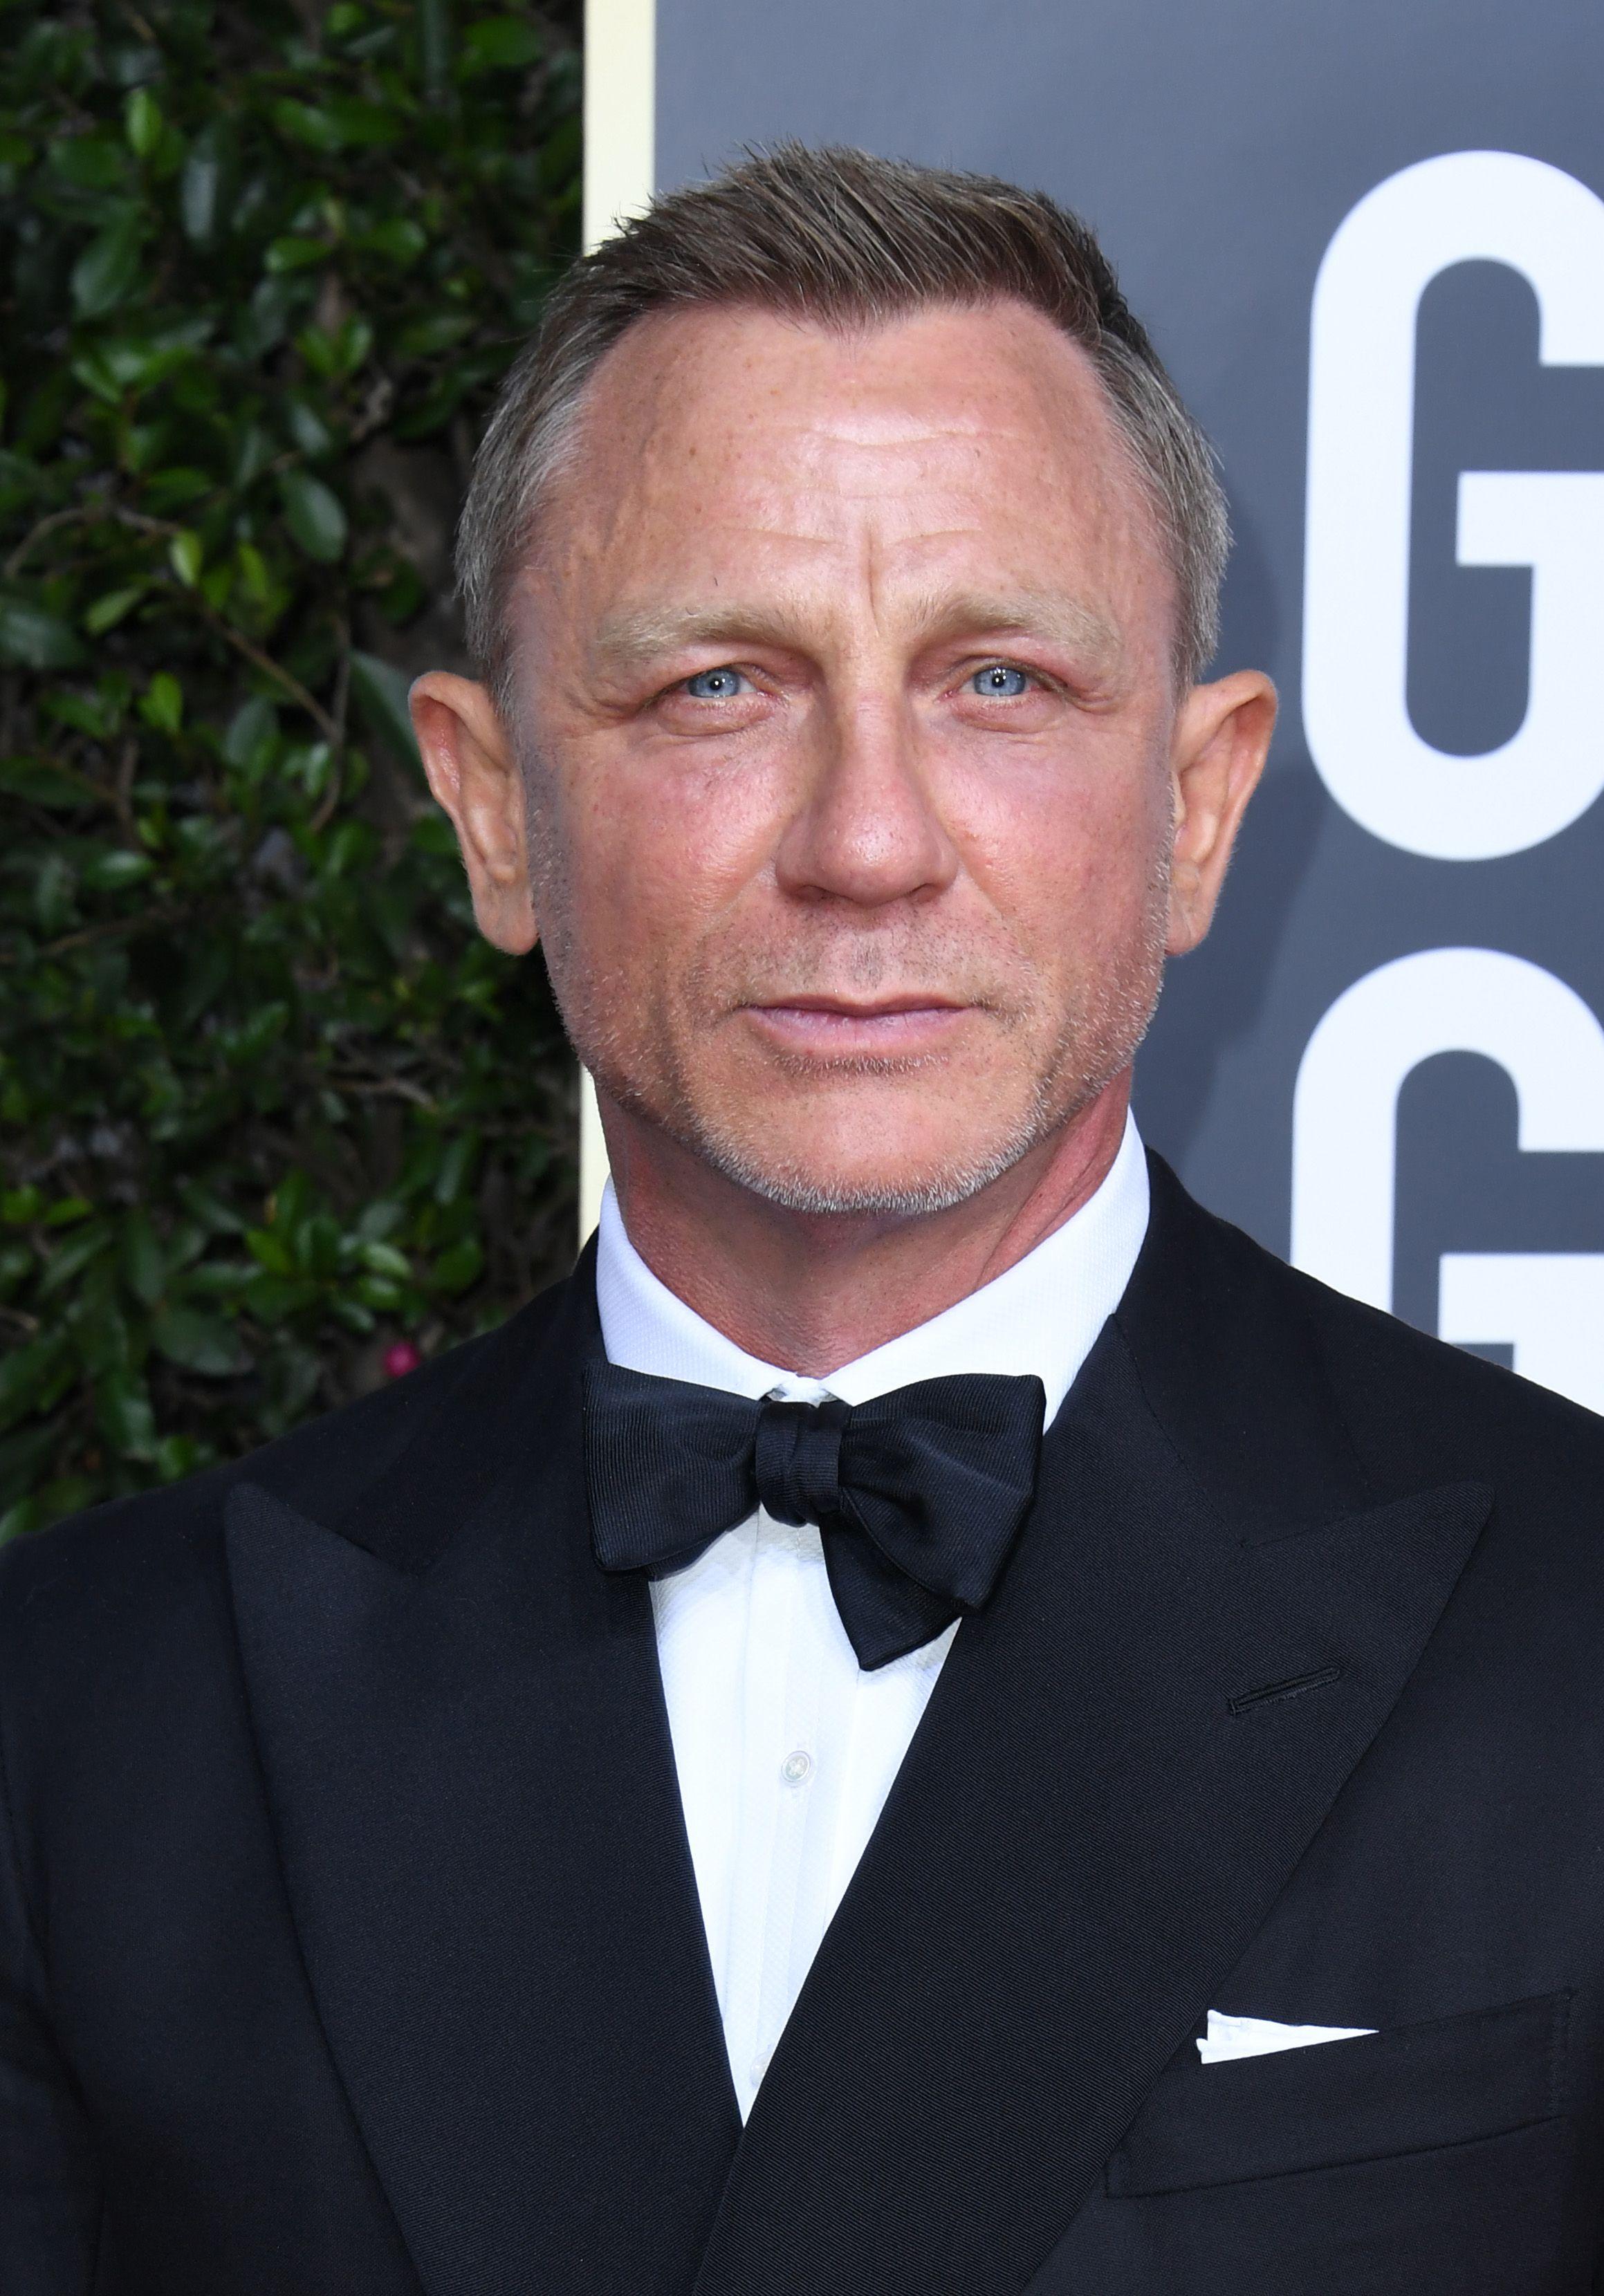 Daniel Craig, 51, hides his locks after it's revealed he